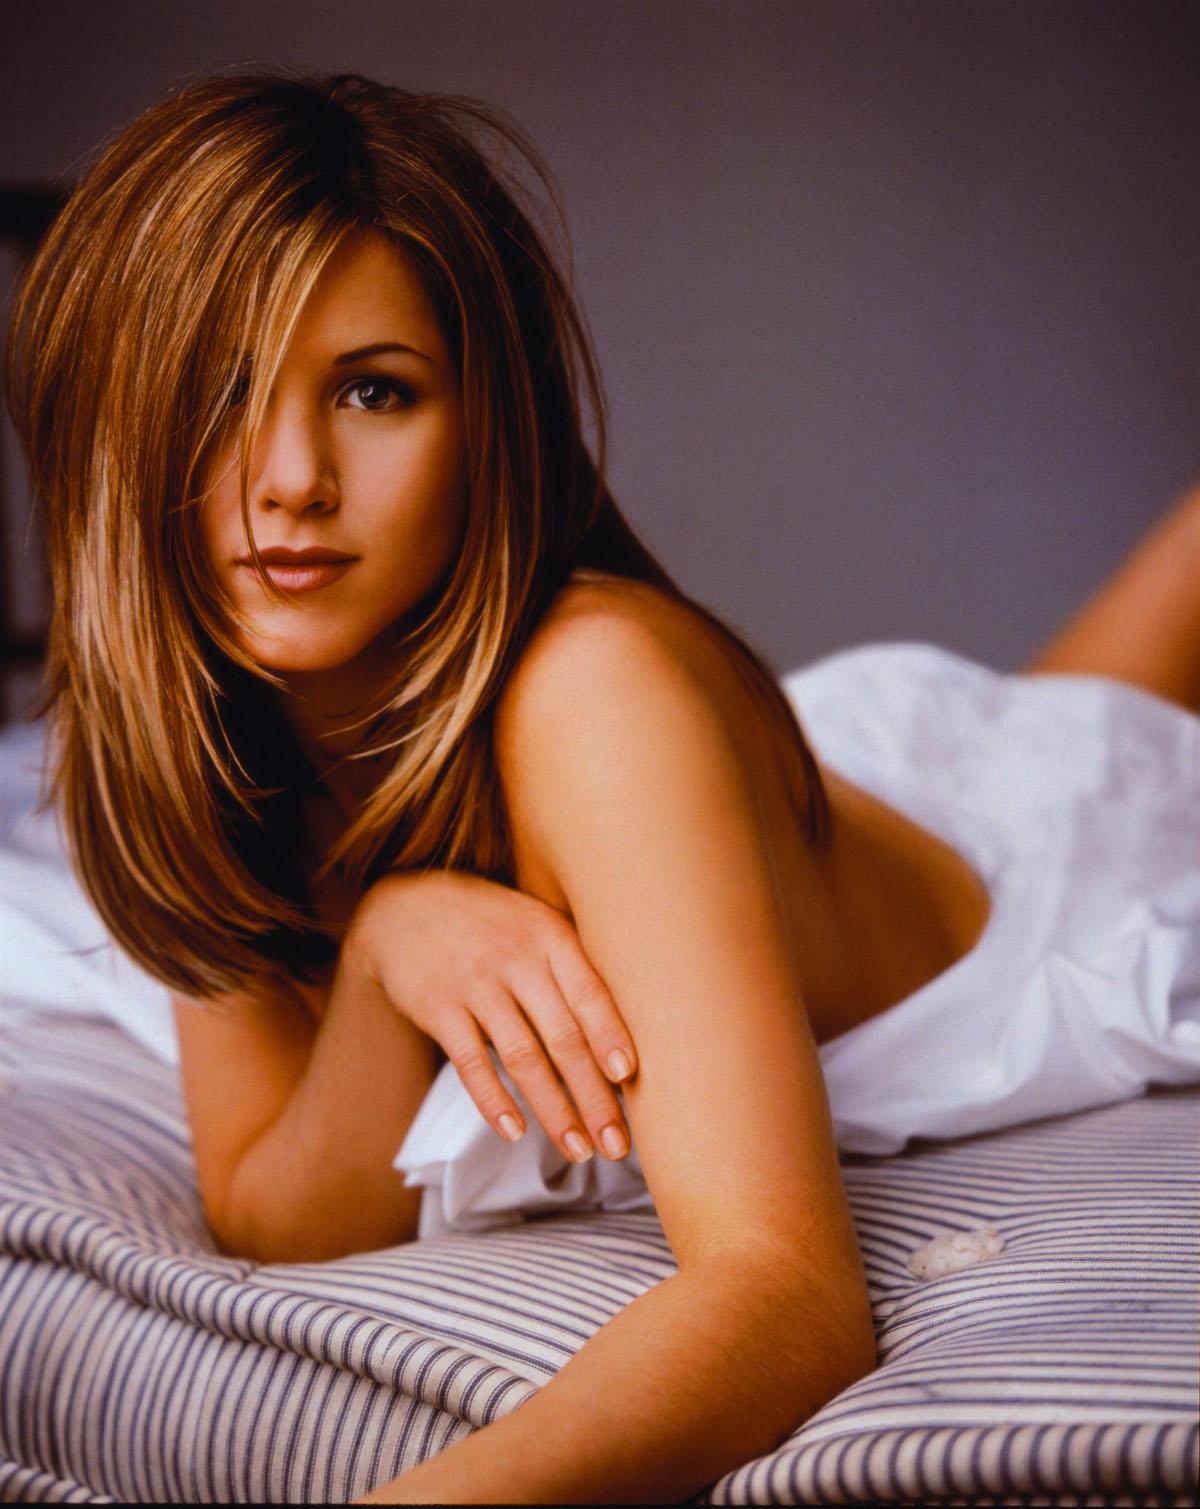 http://4.bp.blogspot.com/_ly7xhwPkm04/R2CE4uFn02I/AAAAAAAAAQ4/CQot38UIuNU/s1600/Jennifer_Aniston11.jpg